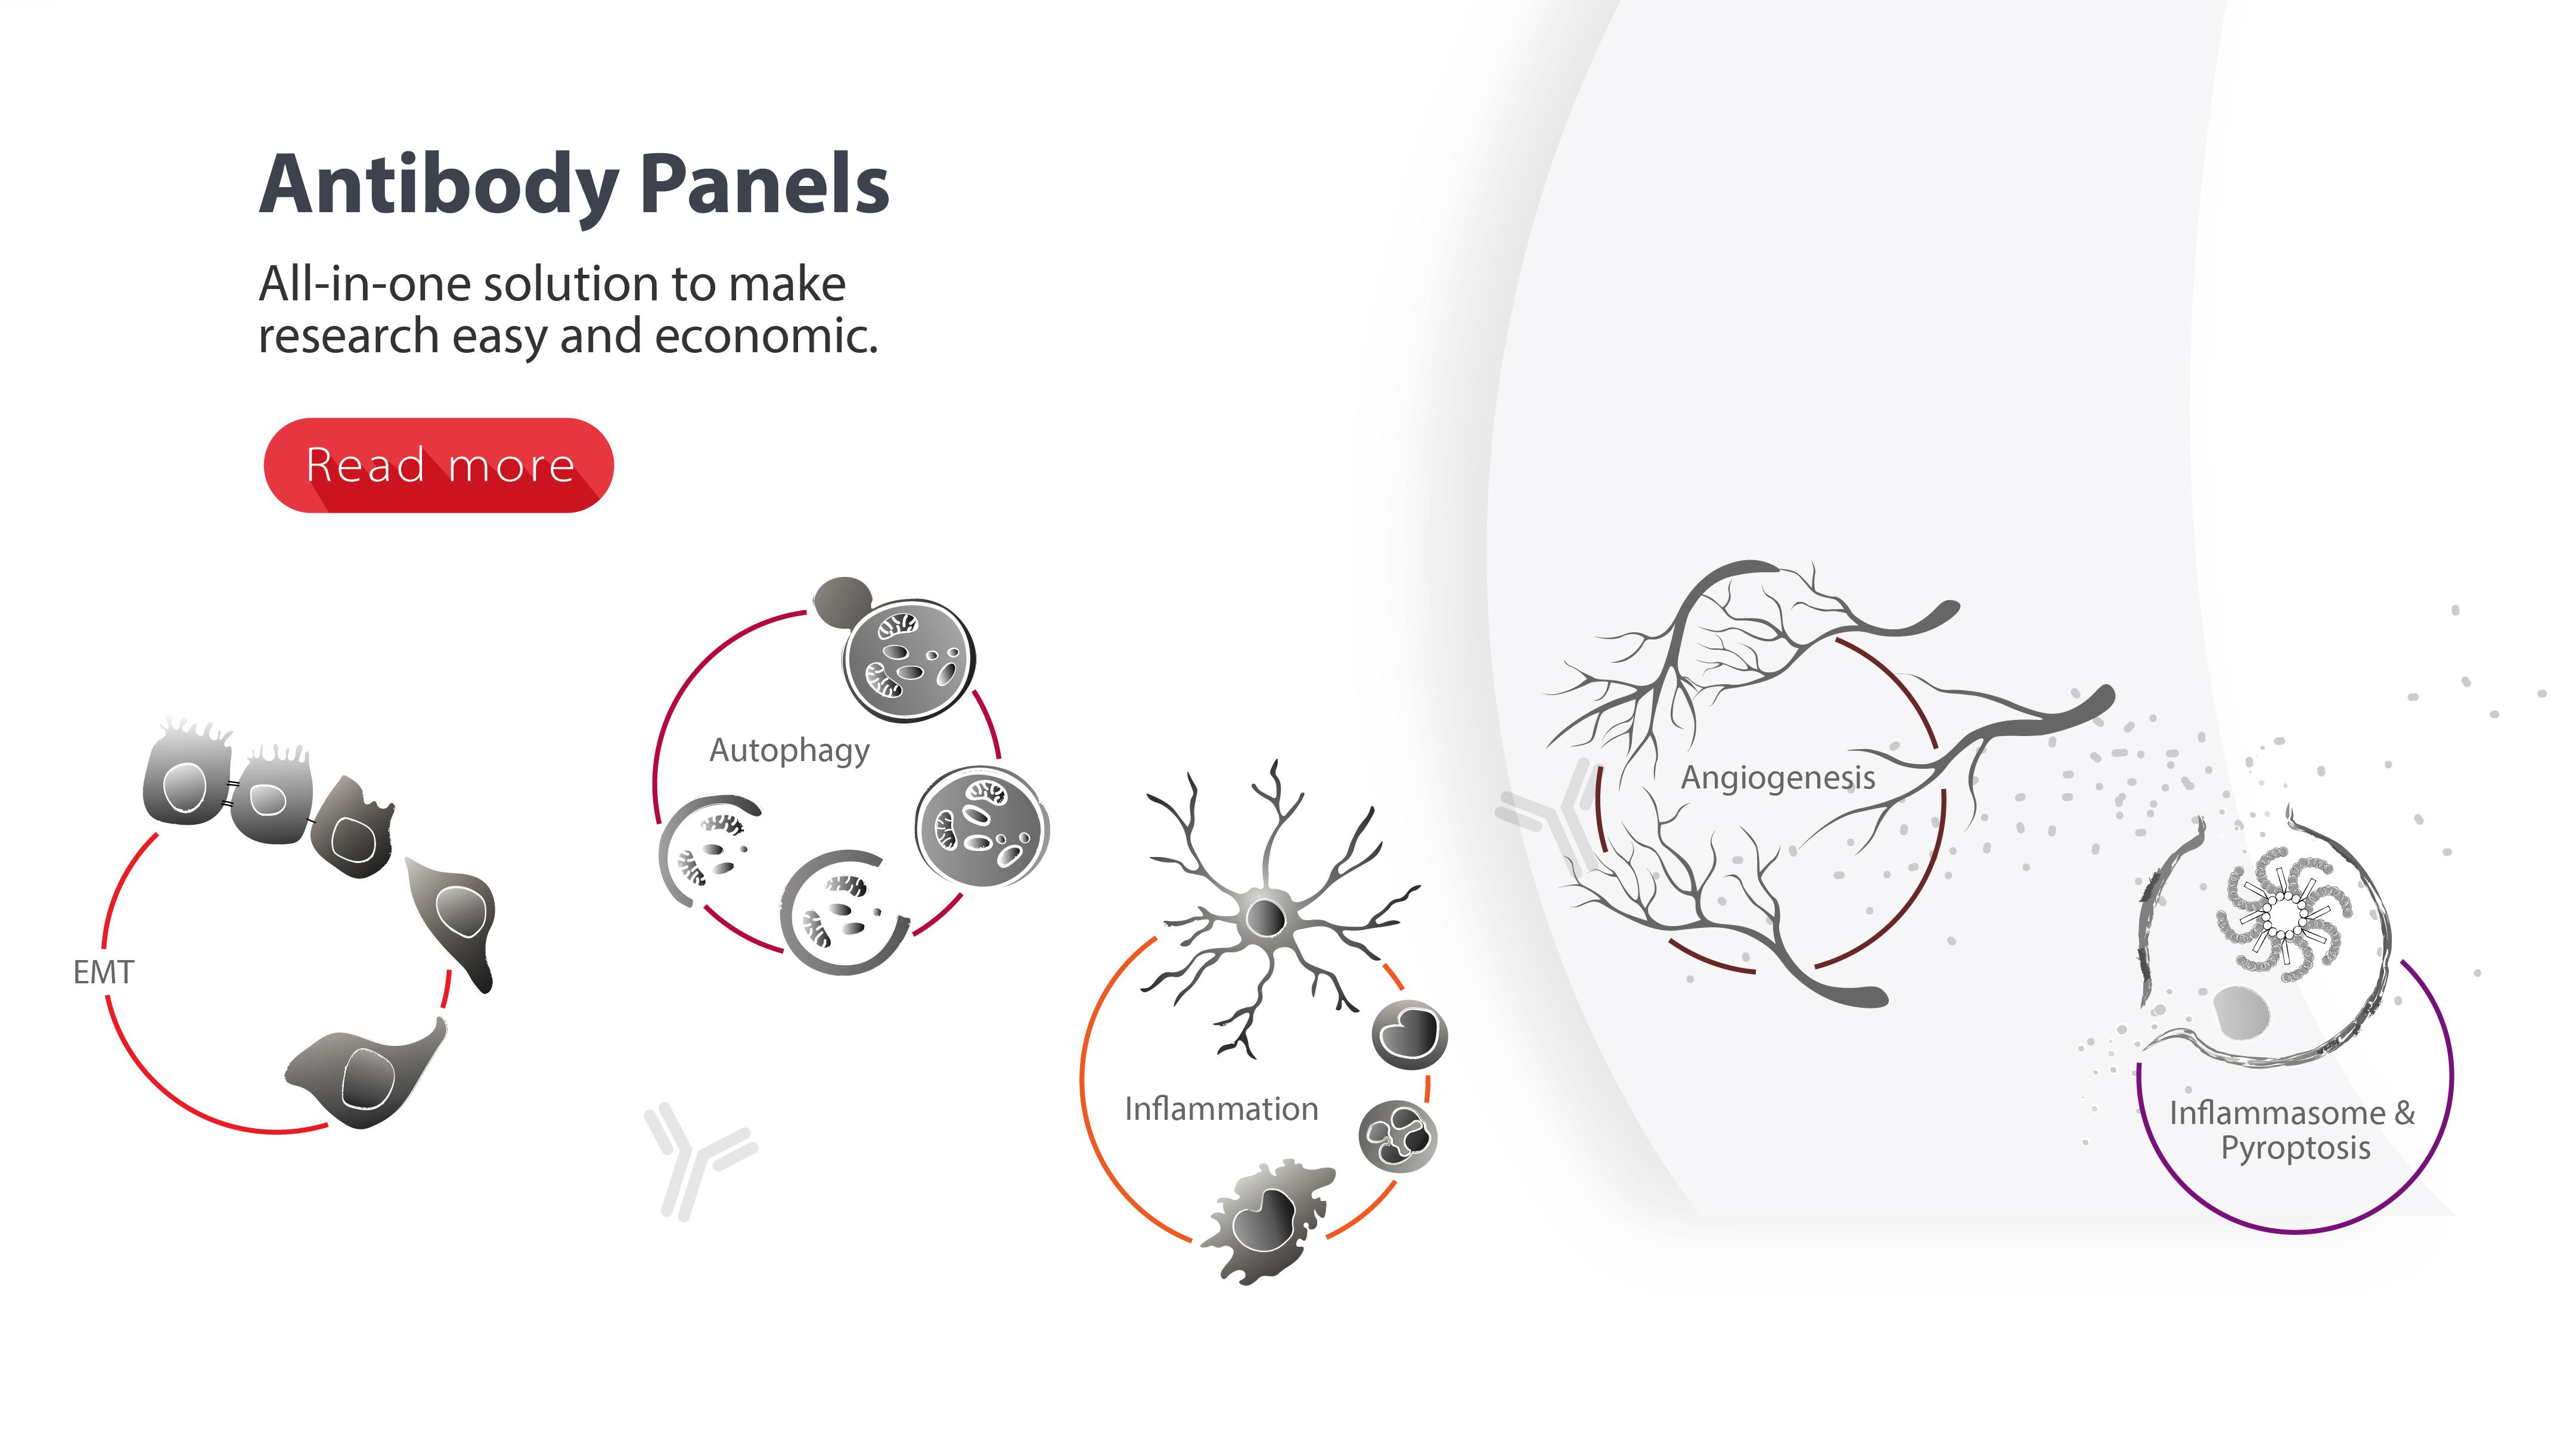 arigo's Antibody Panels